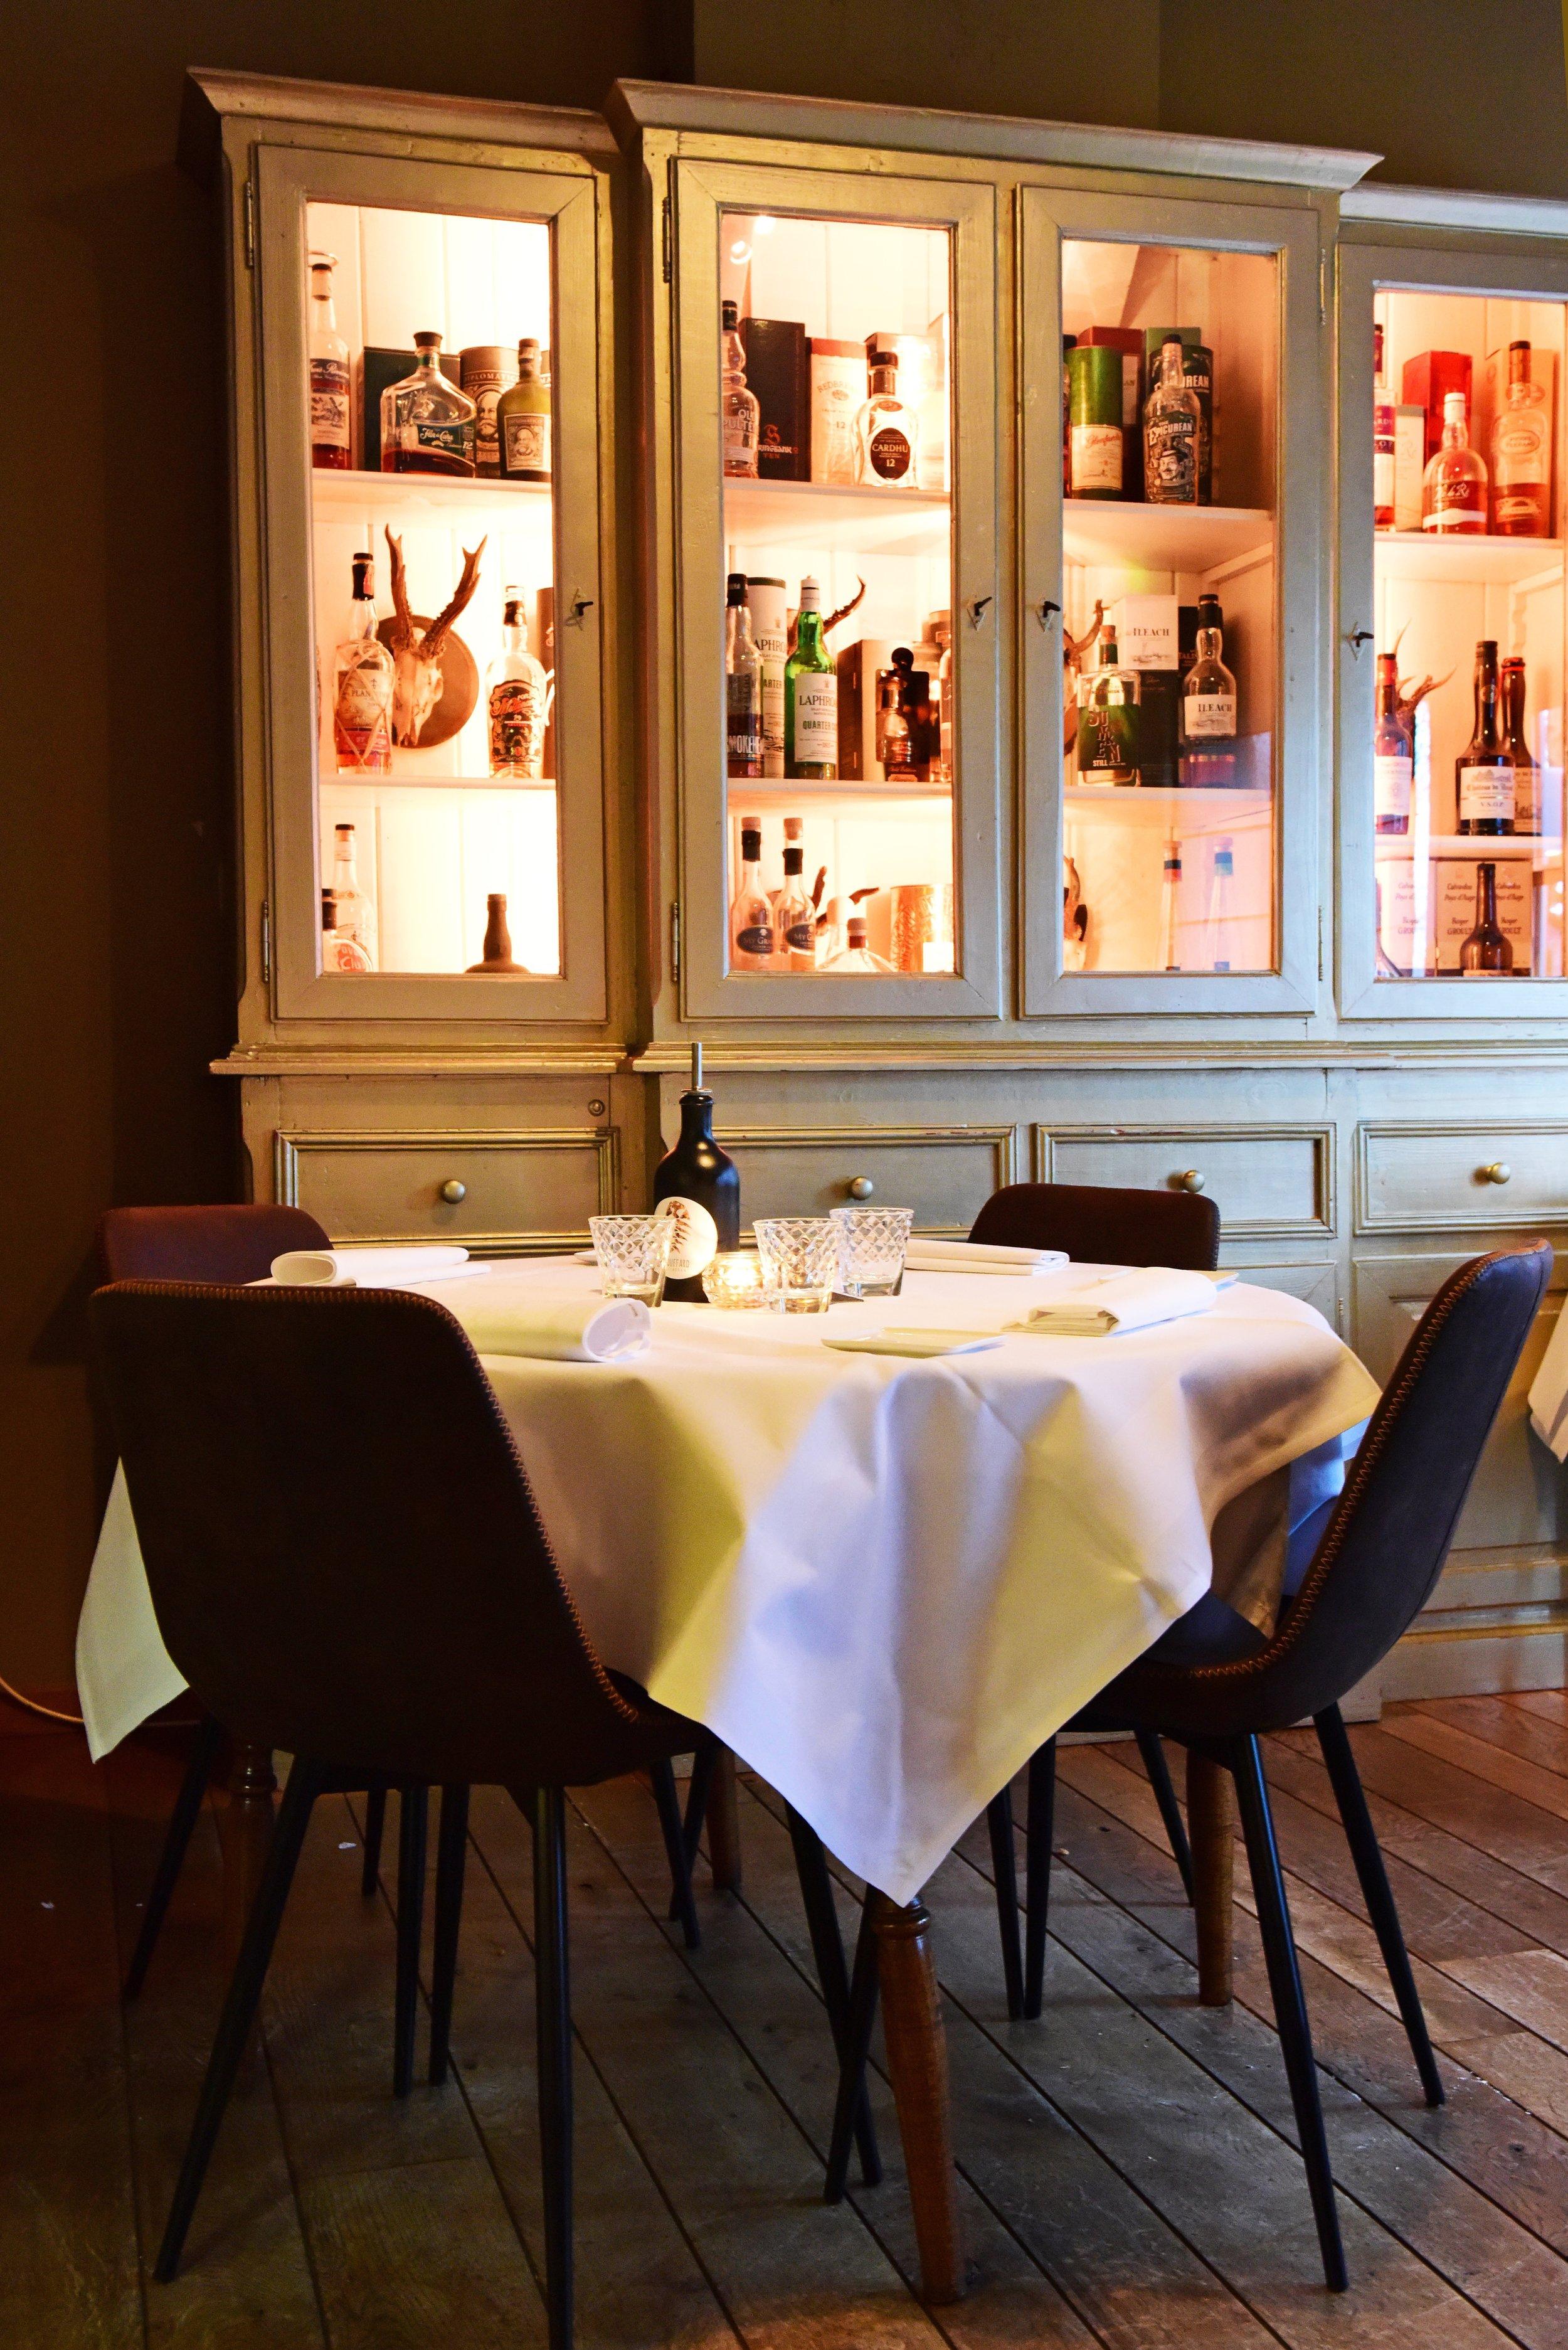 bouffard restaurant mol bart albrecht tablefever food fotograaf.0008.jpg